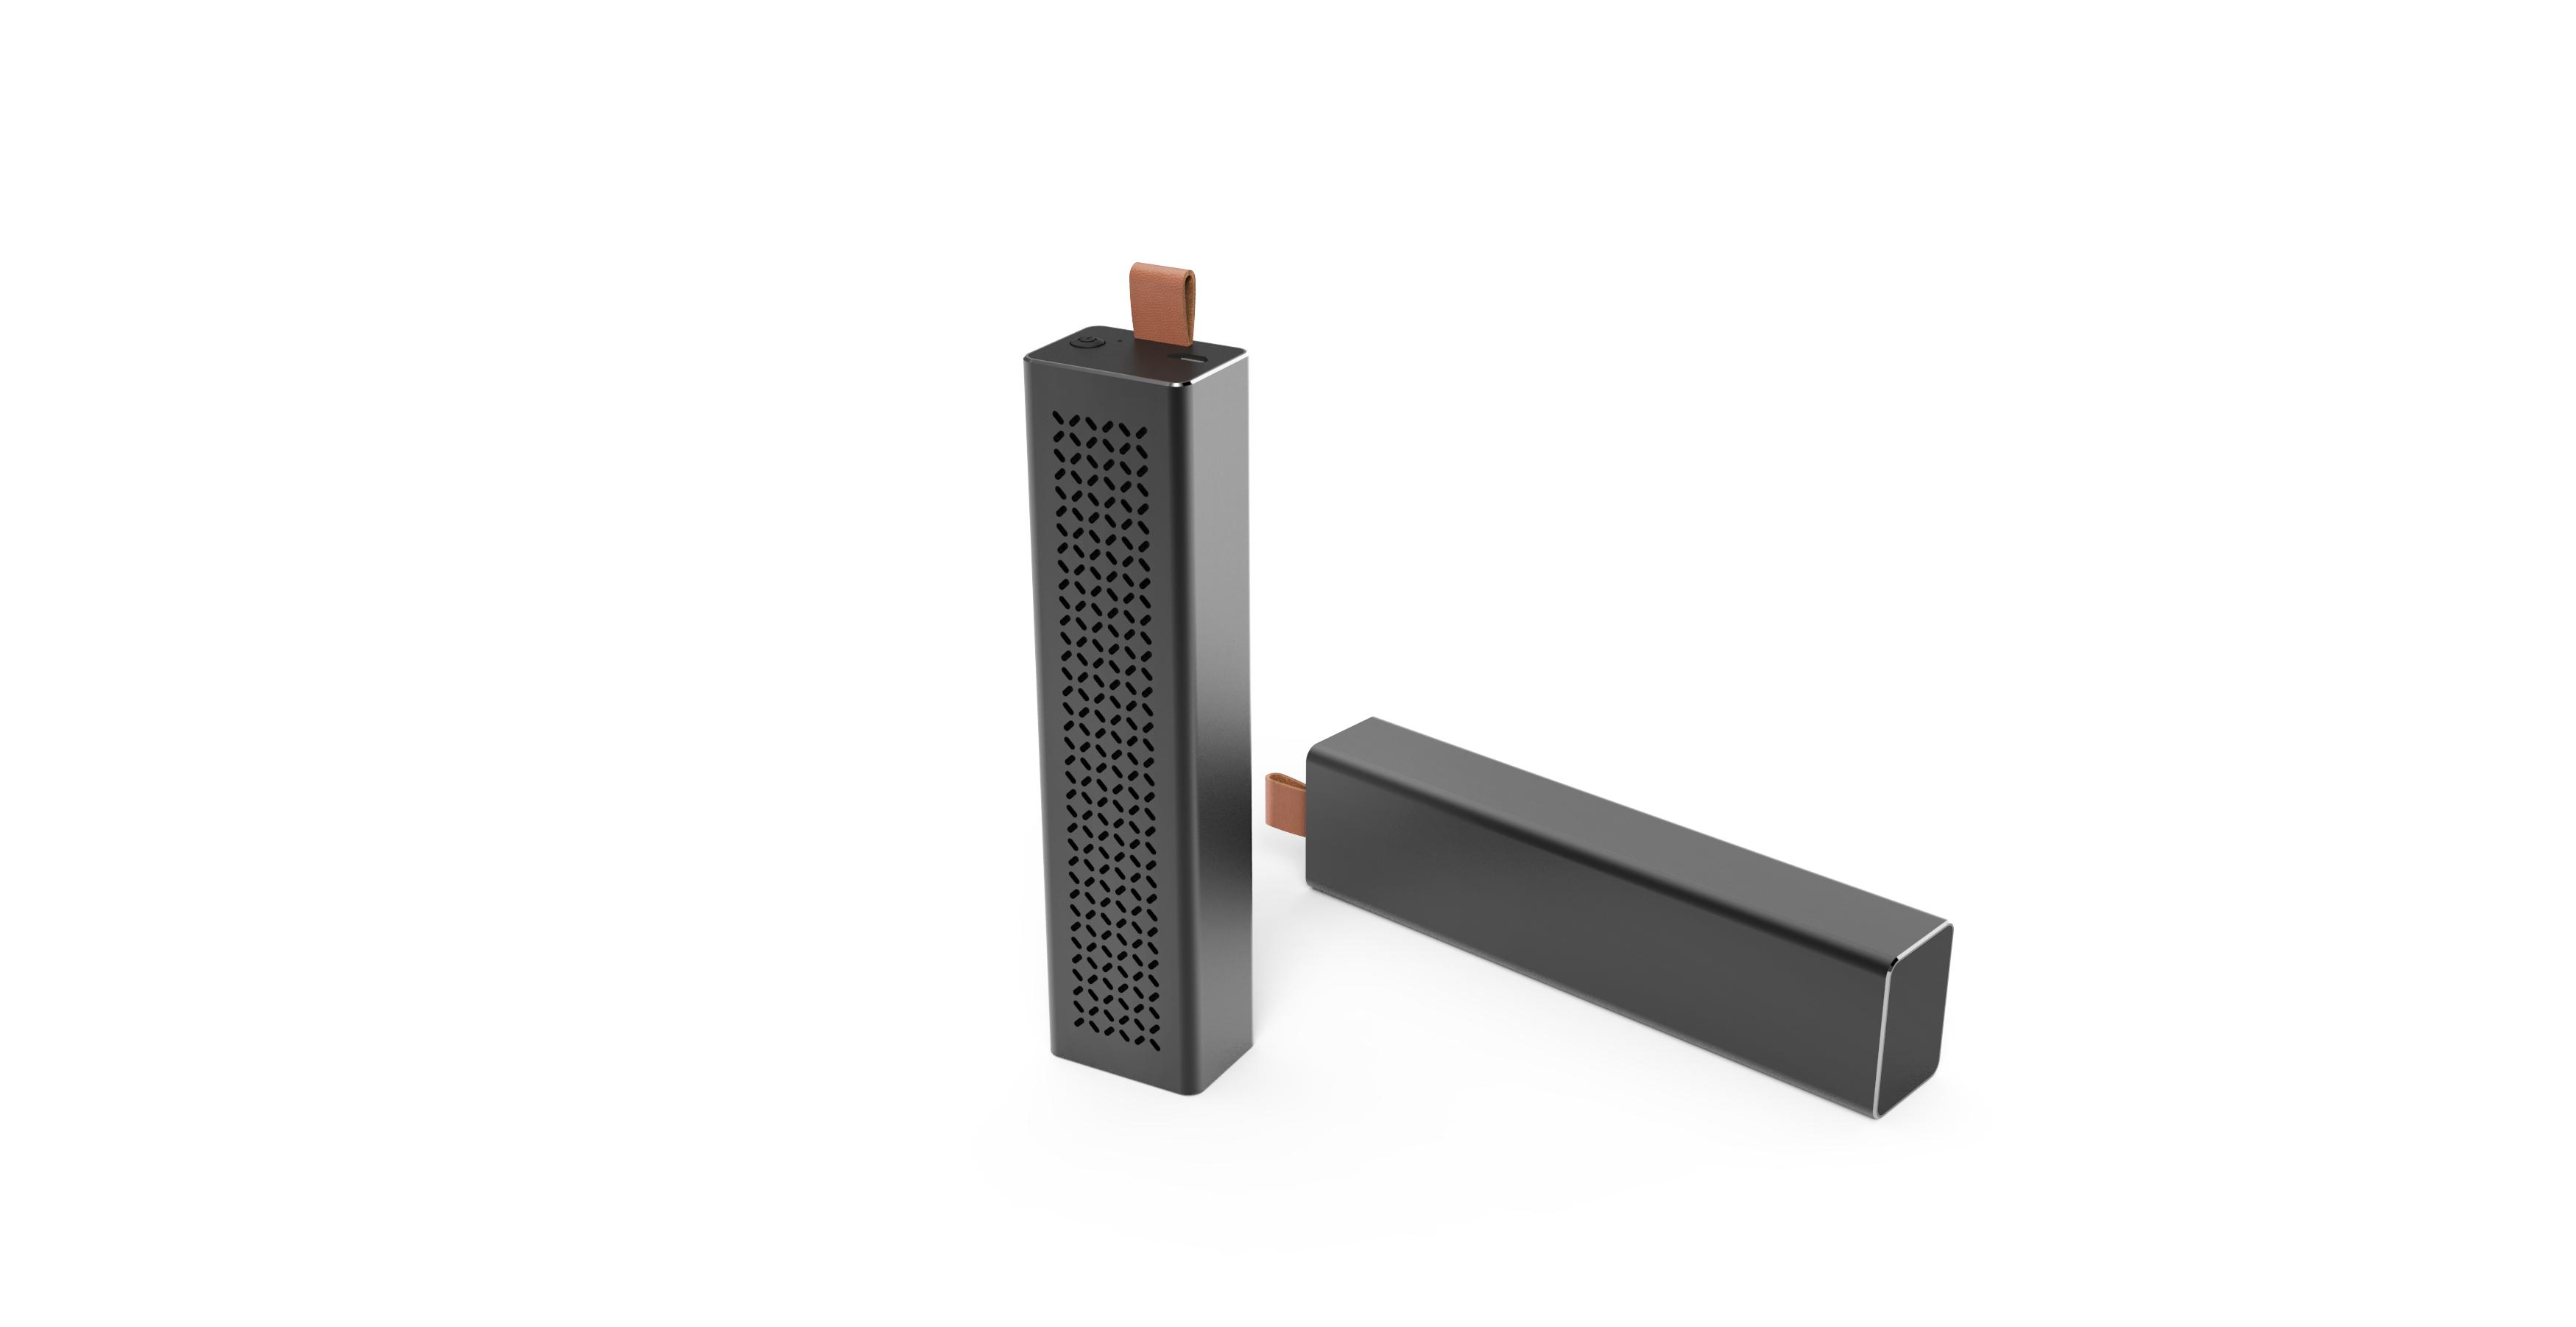 Sleek Metal Case Rectangular Pocket Bluetooth Speaker Bluit-in Macrophone 800mAh Battery